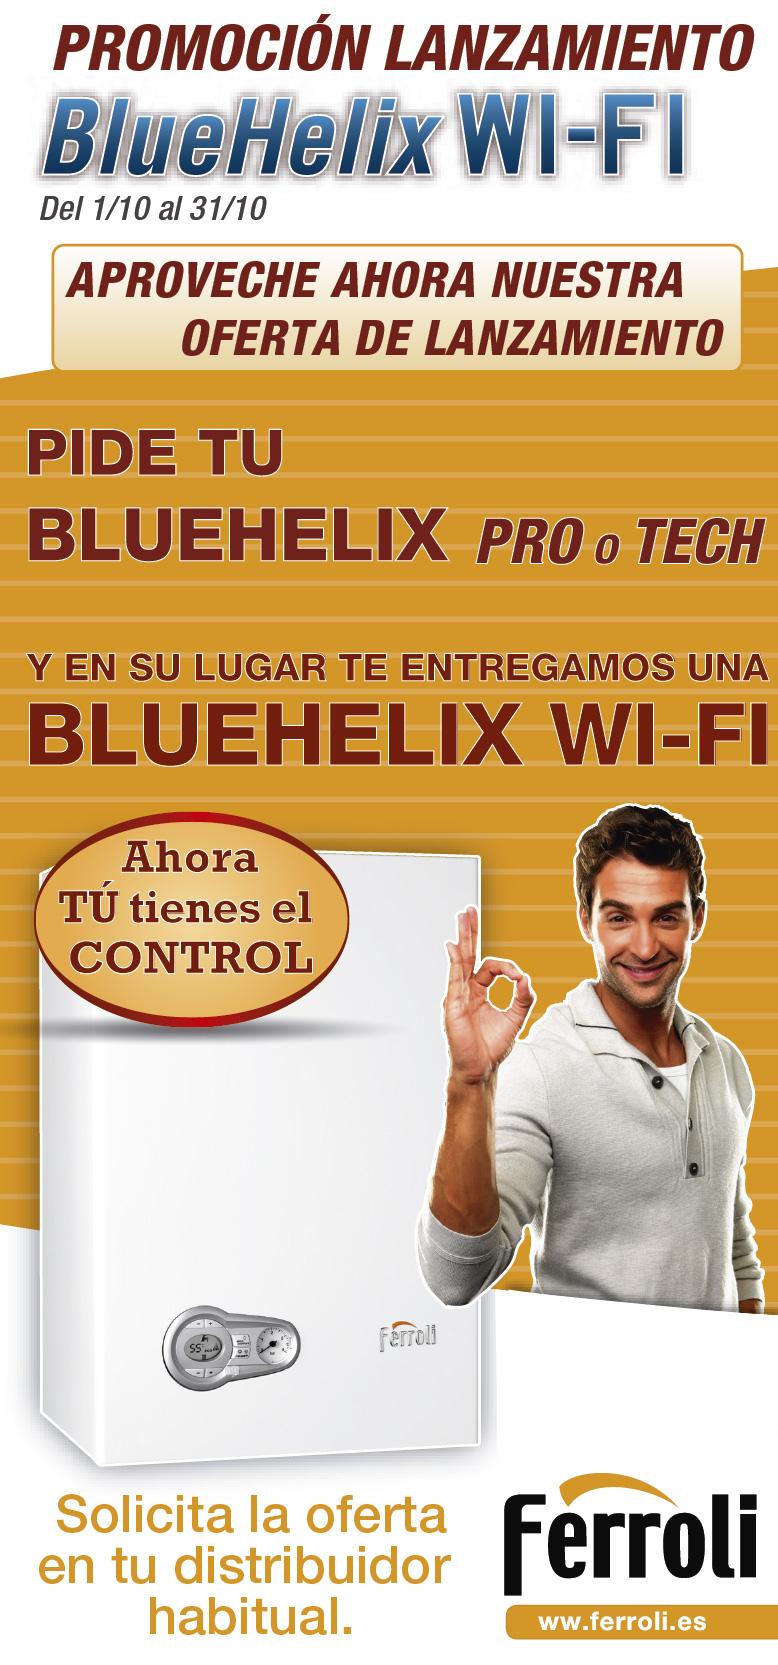 promo-bluehelix-ferroli